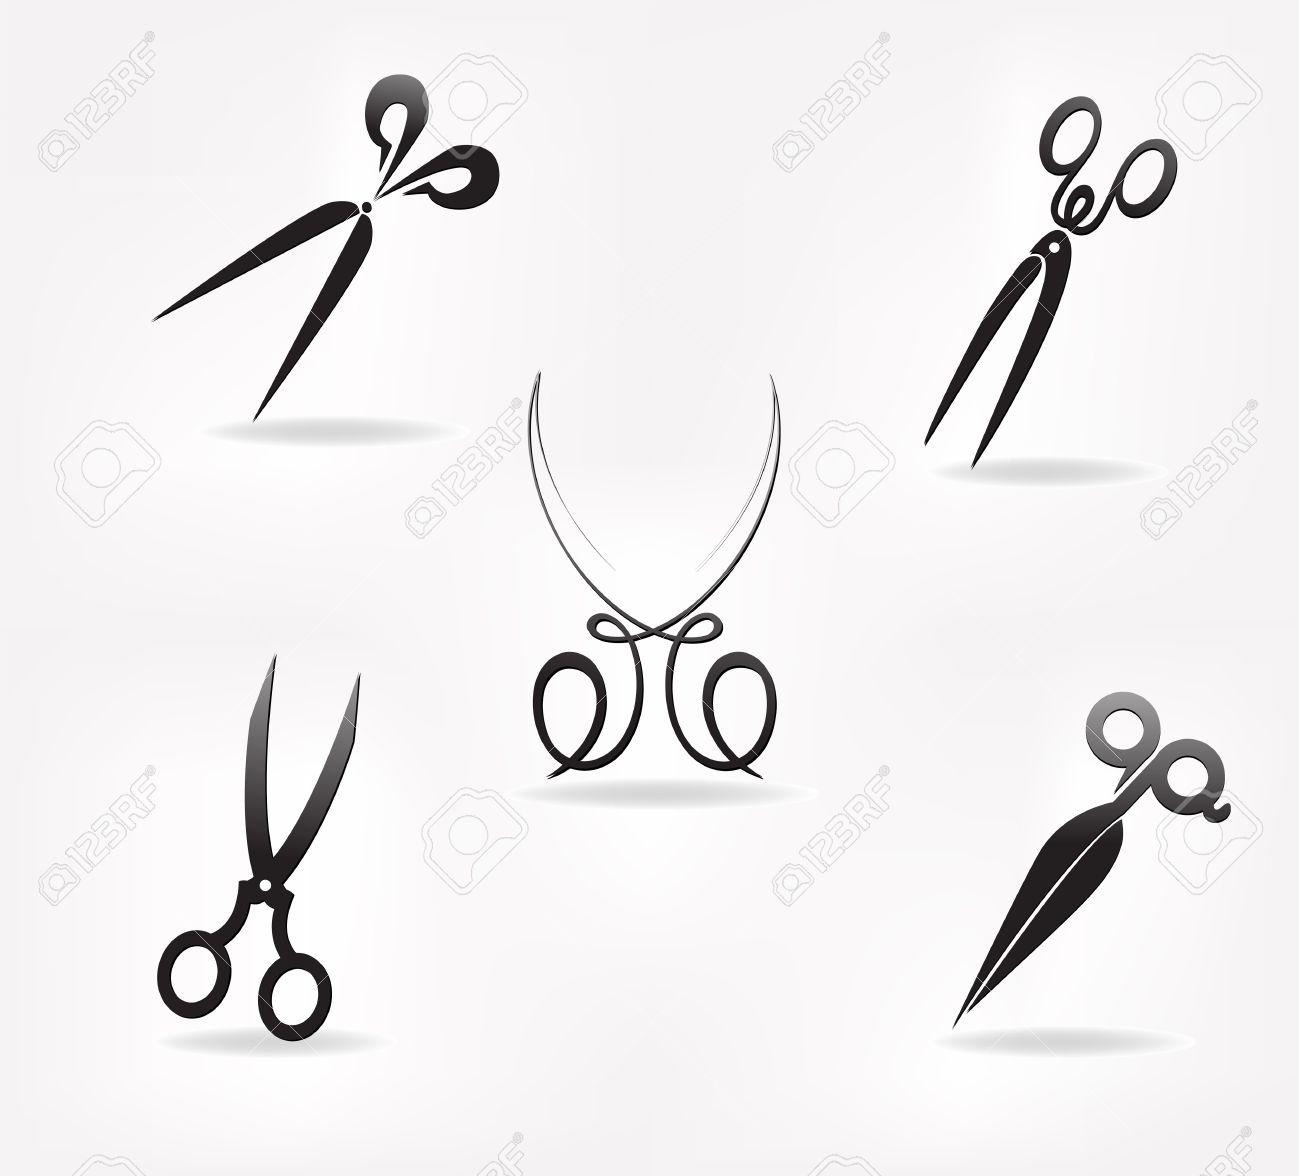 scissors. stylization. design element for vector illustration Stock Vector - 21736917